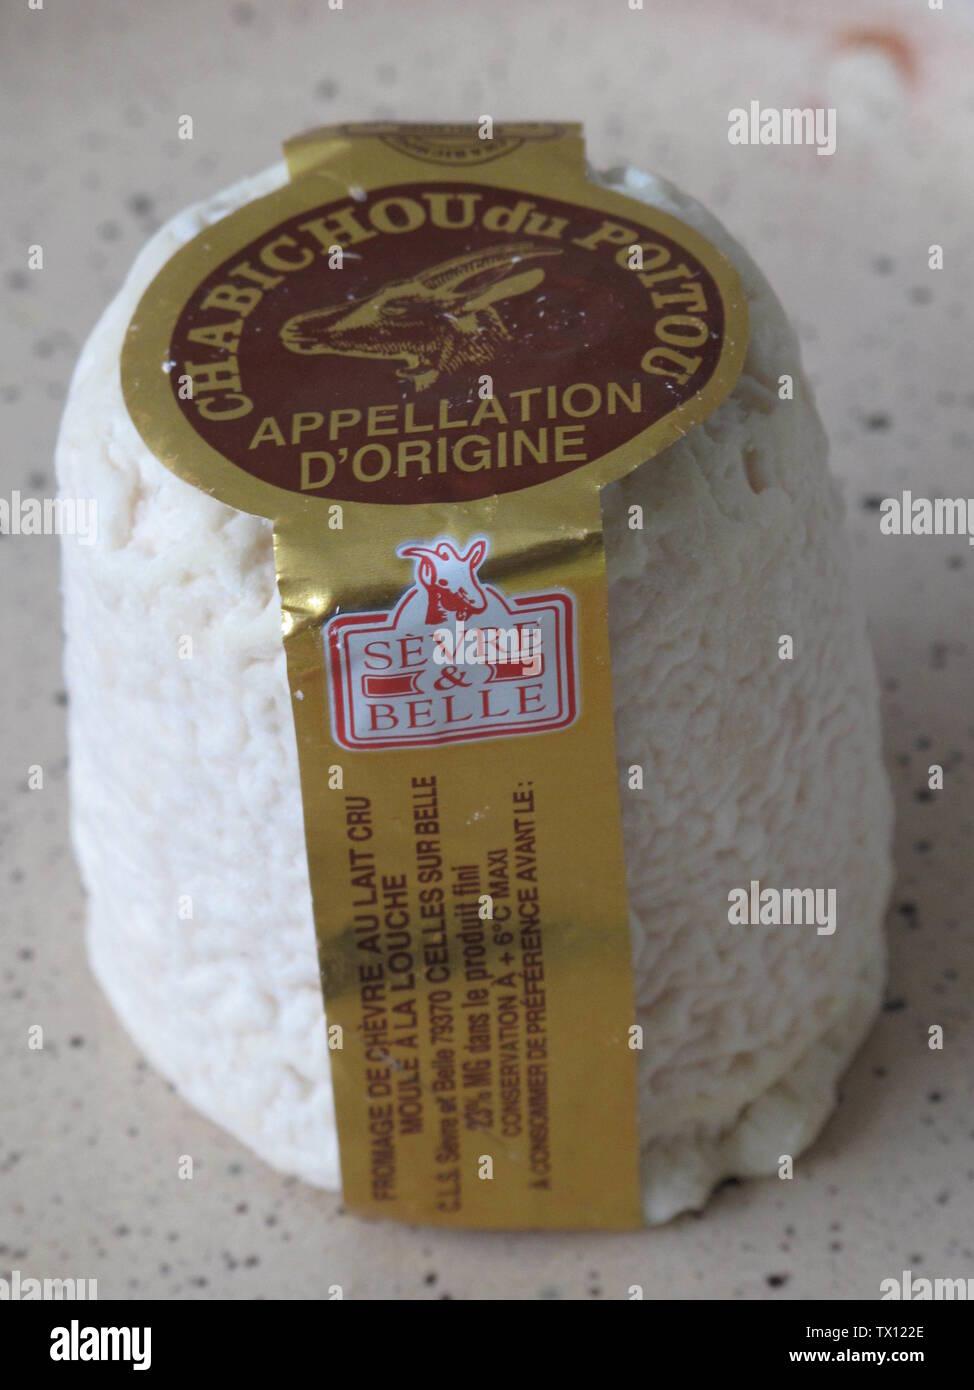 'English: Chabichou du Poitou goat's cheese with its term of origin (Appellation d'origine) Français: Fromage de chèvre Chabichou (Appellation d'origine); 6 February 2010; Own work; Tangopaso; ' - Stock Image